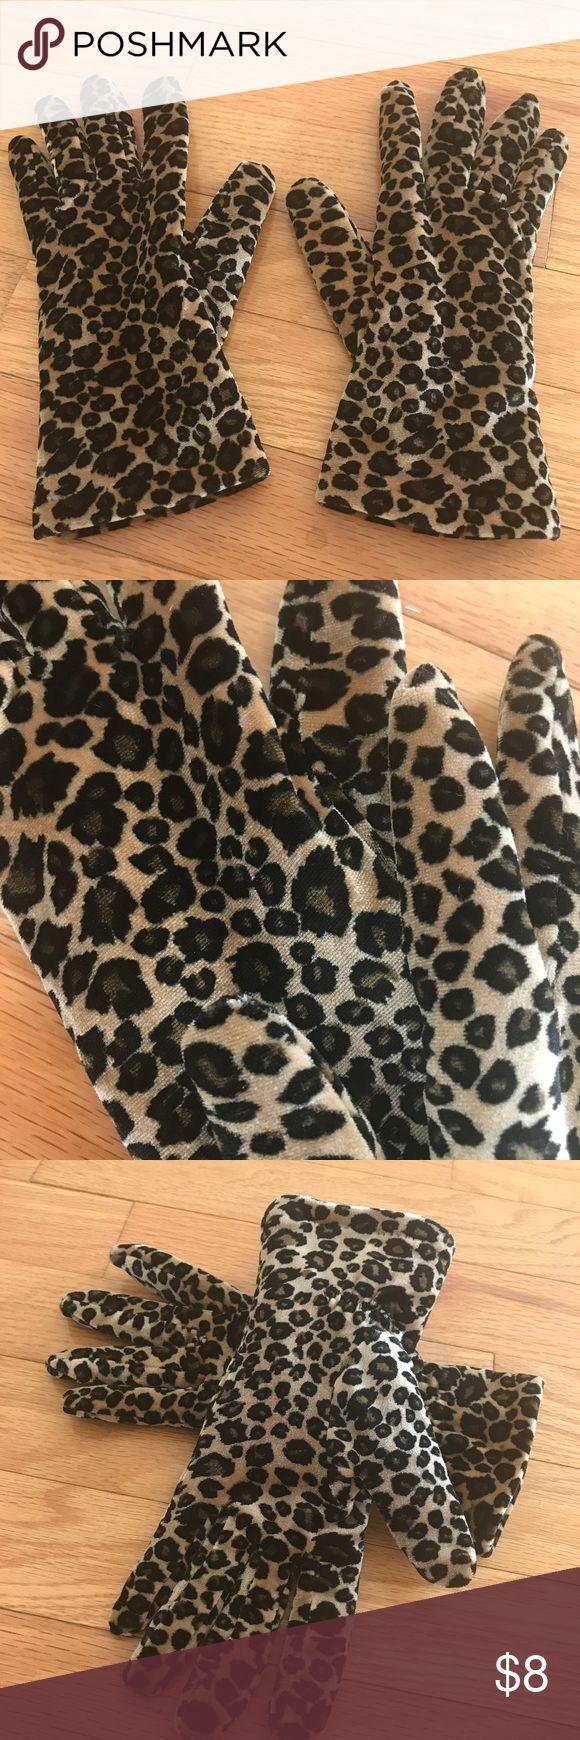 ❄️Thinsulate Gloves, Leopard print❄️ Women's Thinsulate gloves in a super soft leopard print. Excellent condition, one size. Accessories Gloves & Mittens